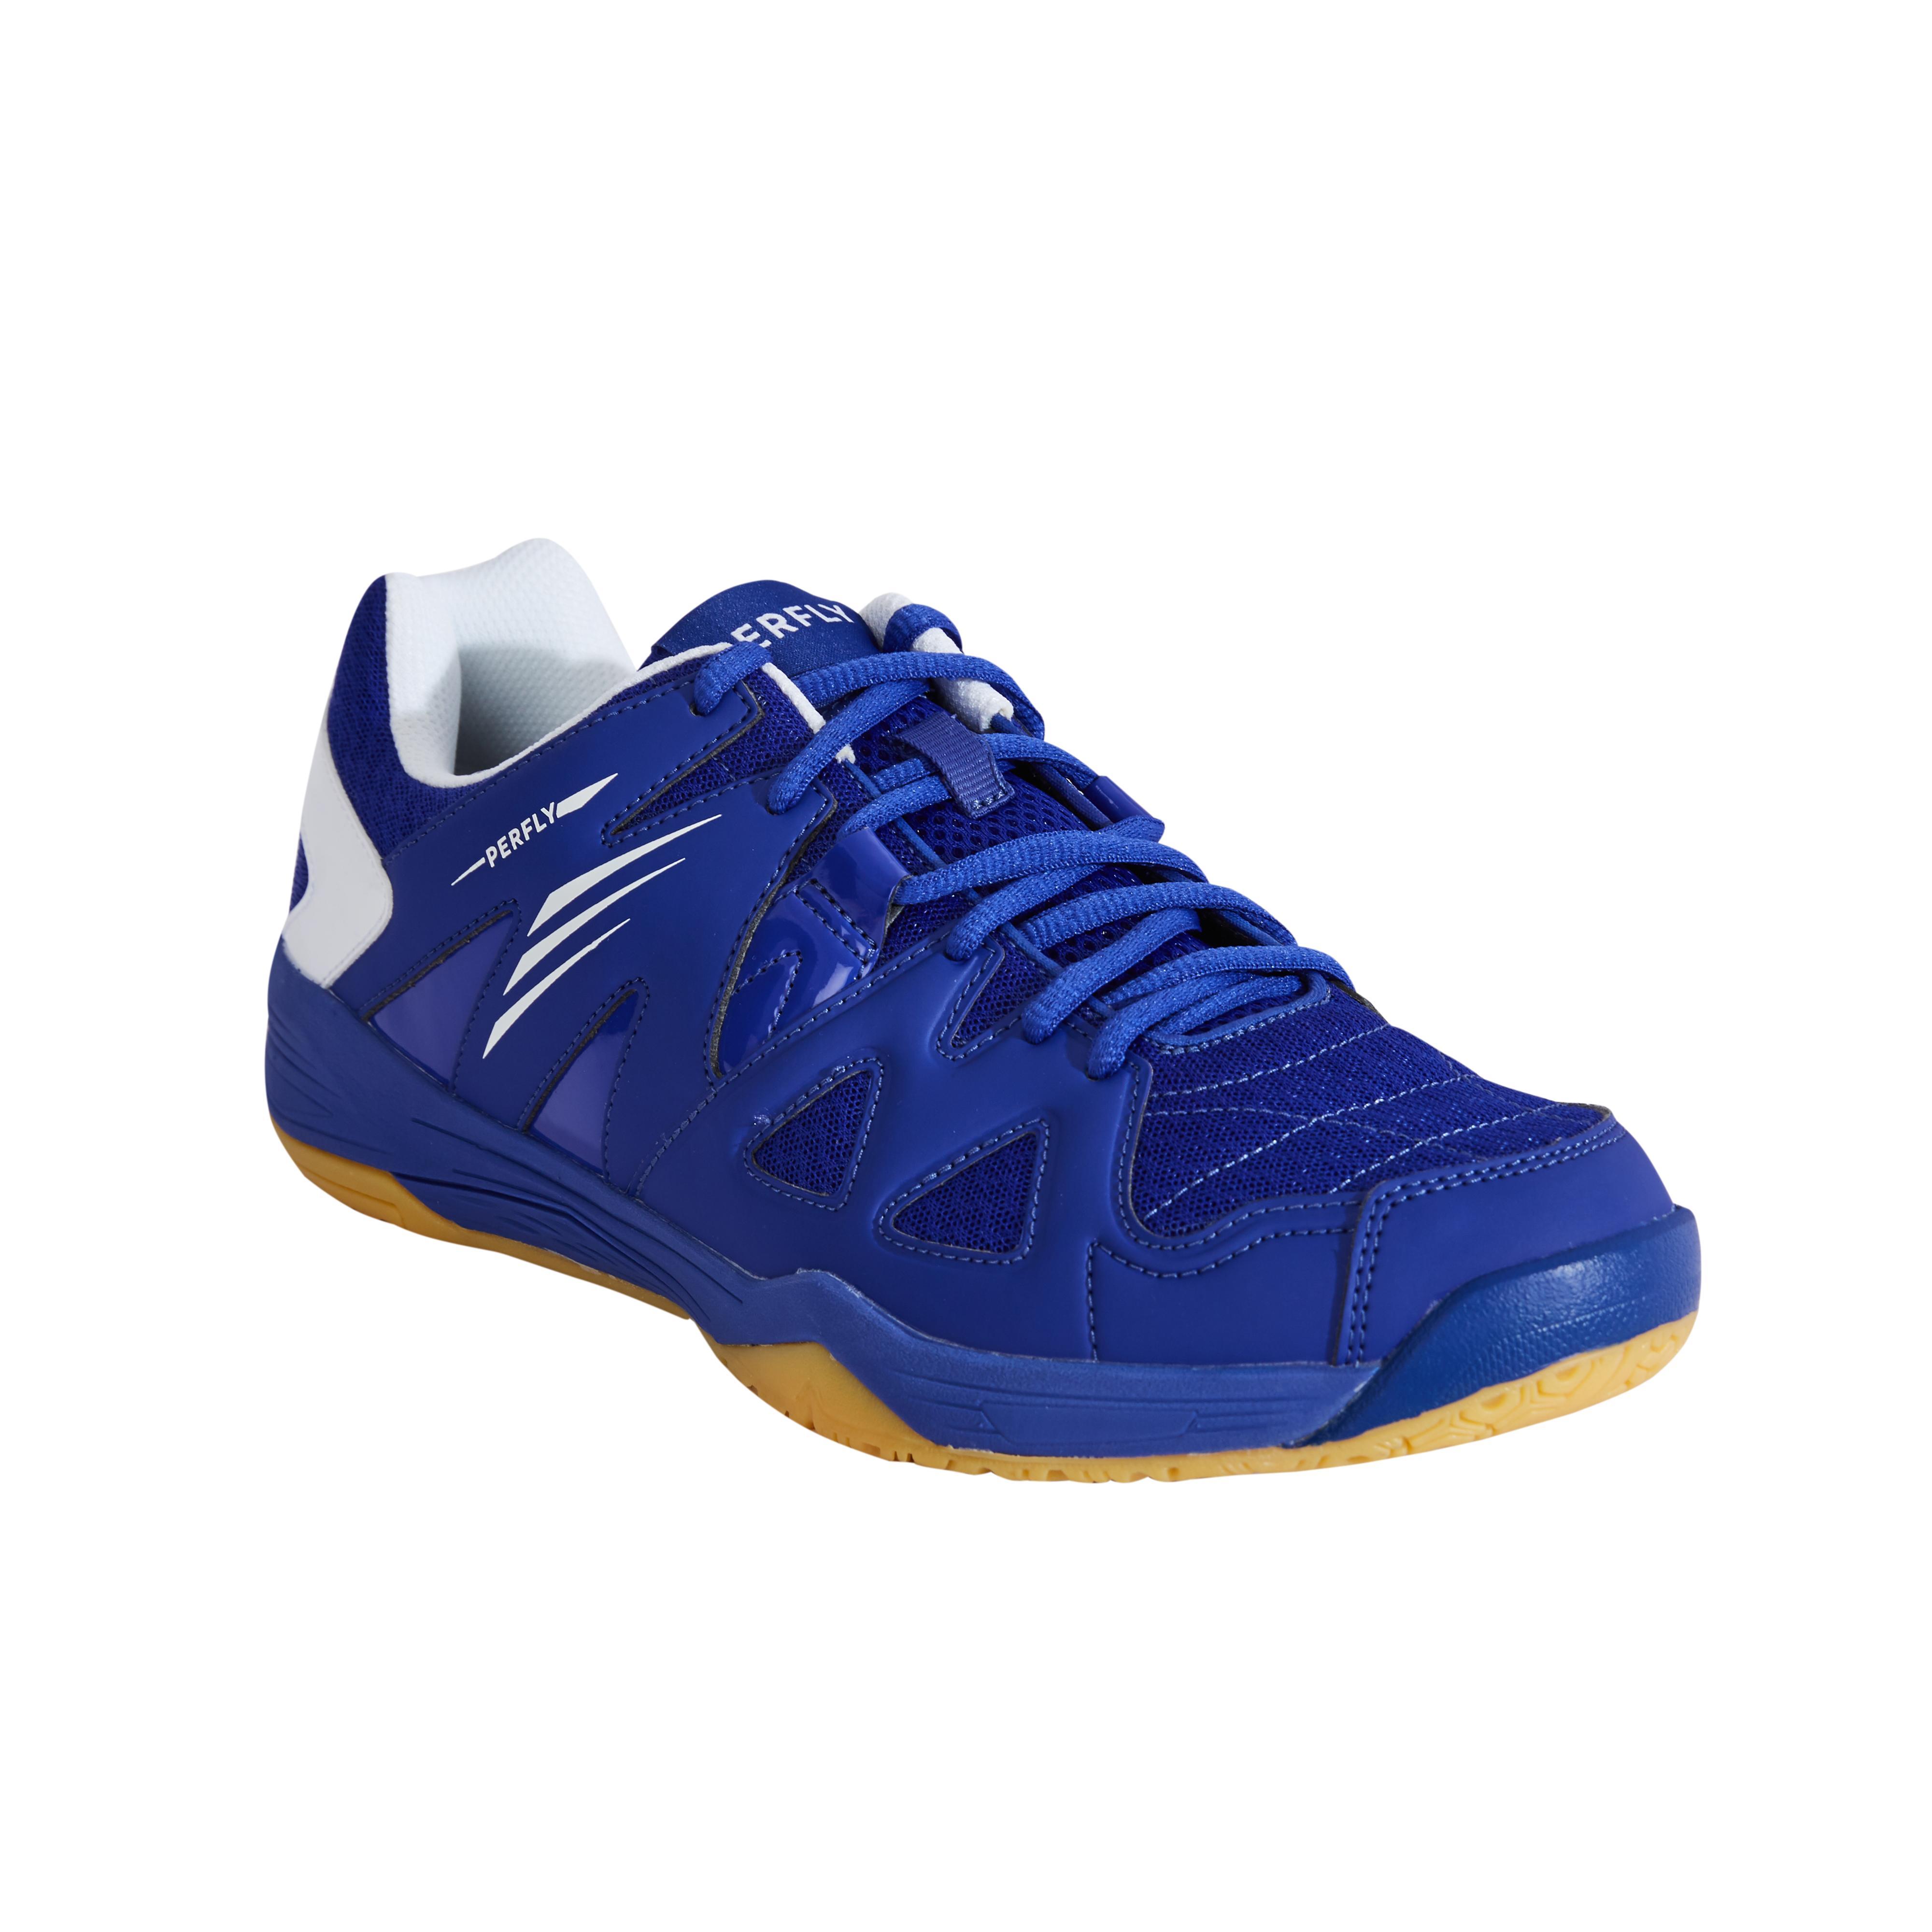 Perfly Chaussures De Badminton pour Homme BS530 - Bleu - Perfly